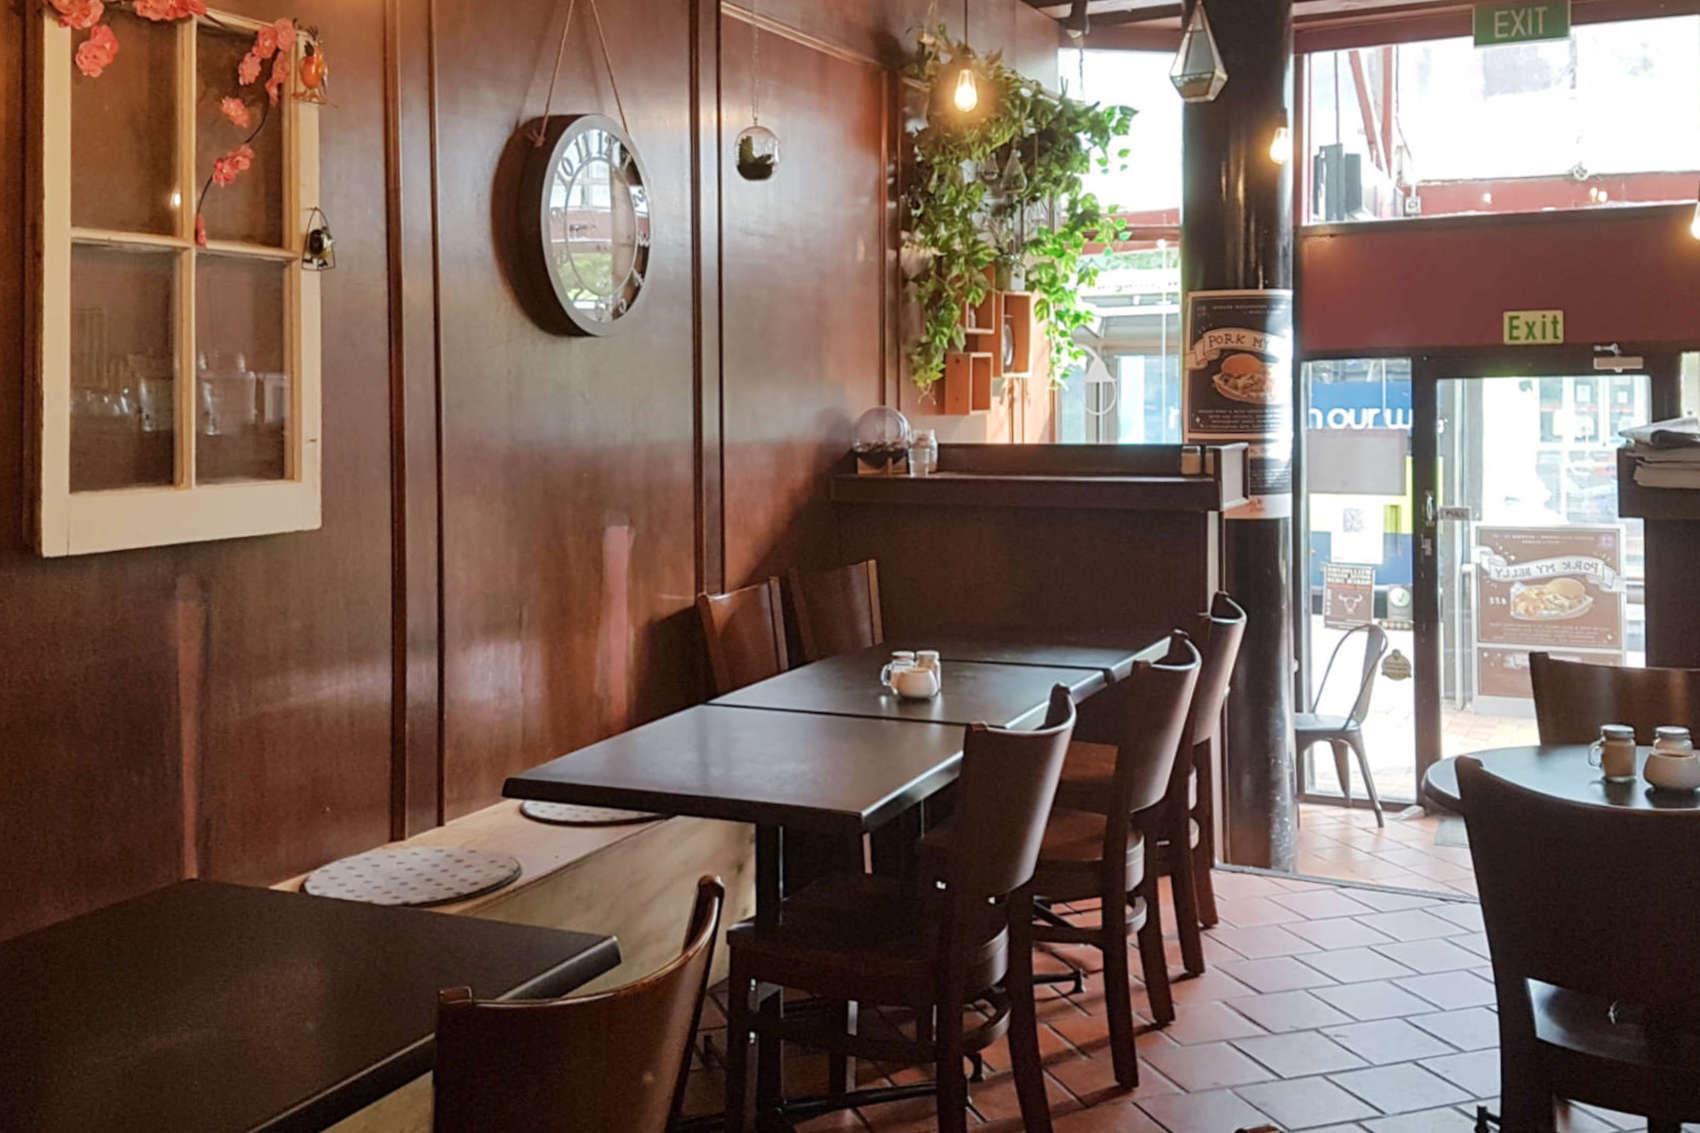 Willi's Kitchen - interior to front